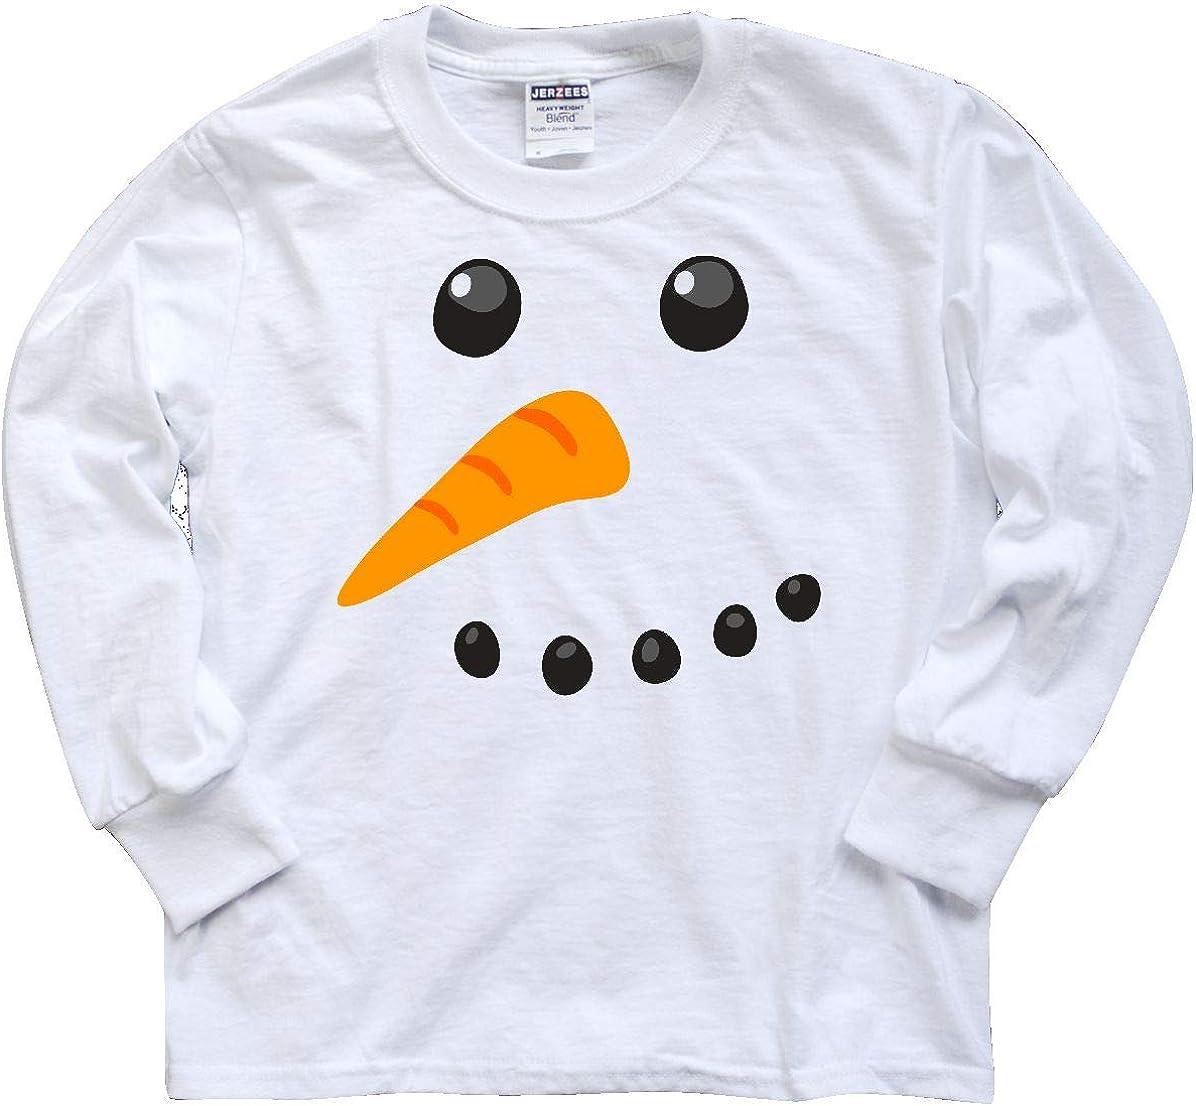 Boys Personalised Christmas Snowman Cotton T-Shirt Age 3-4 Dark Grey